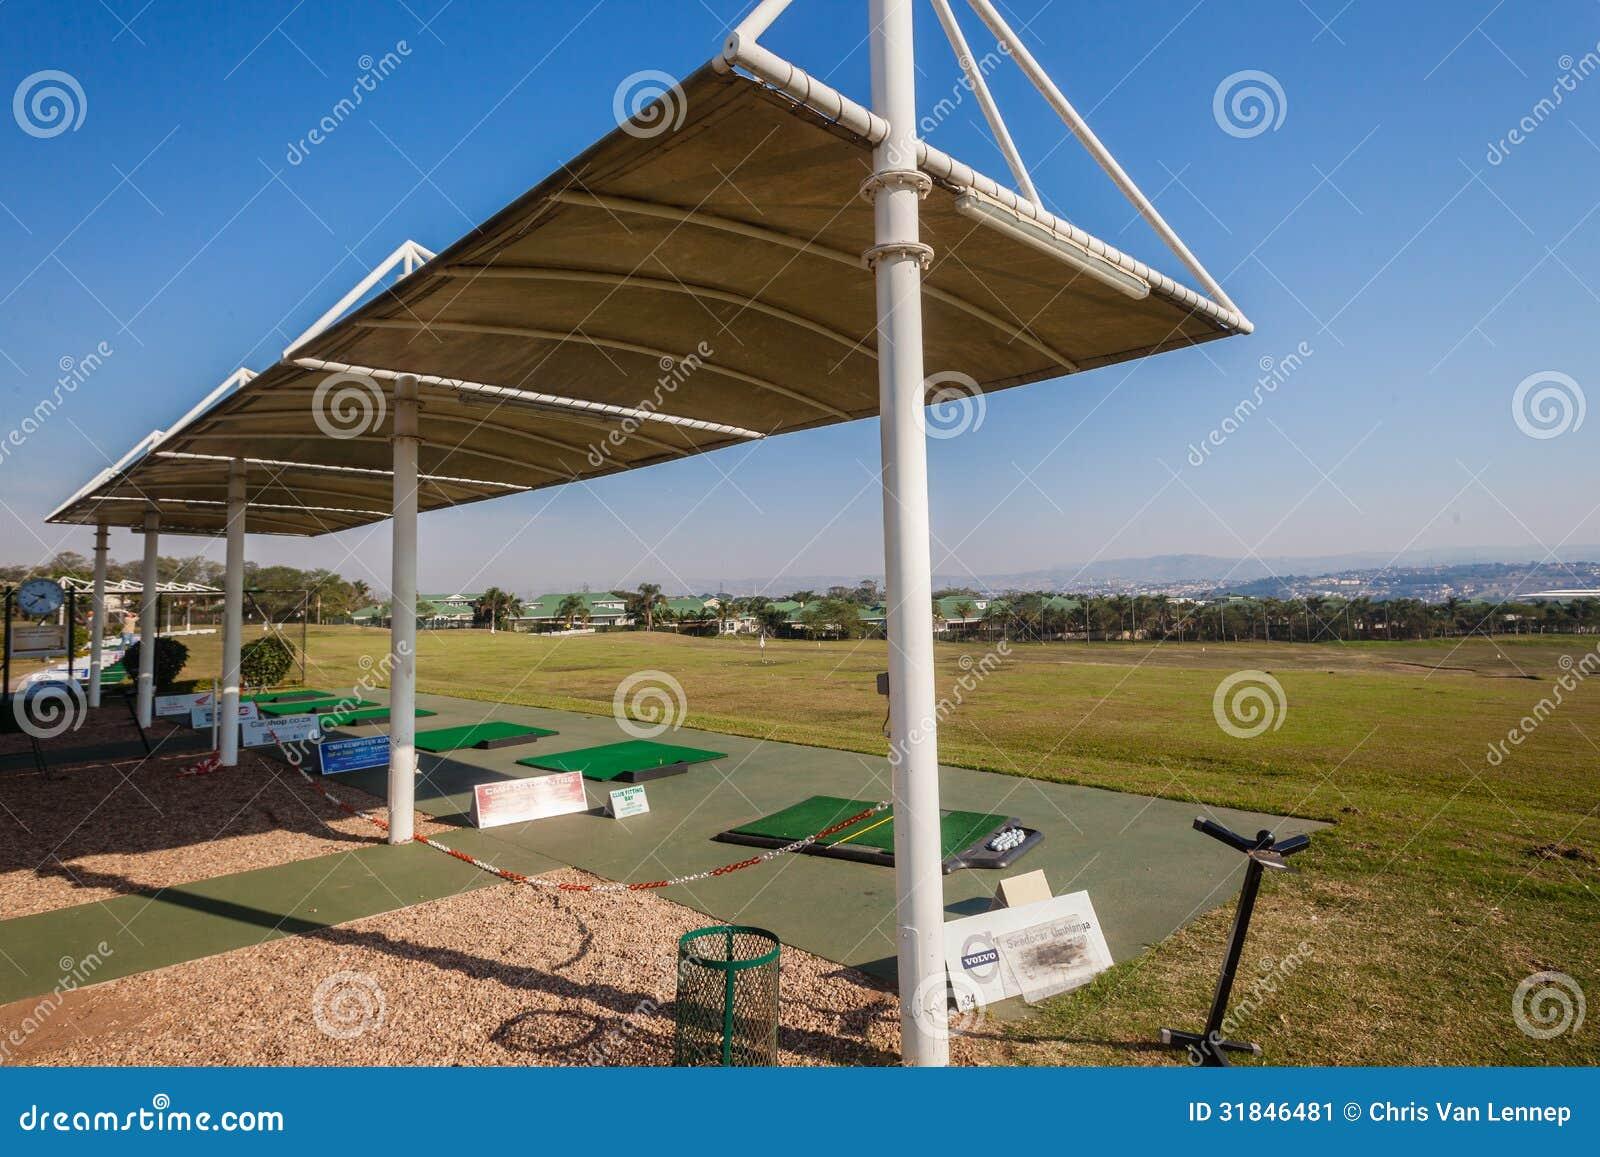 Golf Practice Range Sun Protection Editorial Photo Image Of Balls